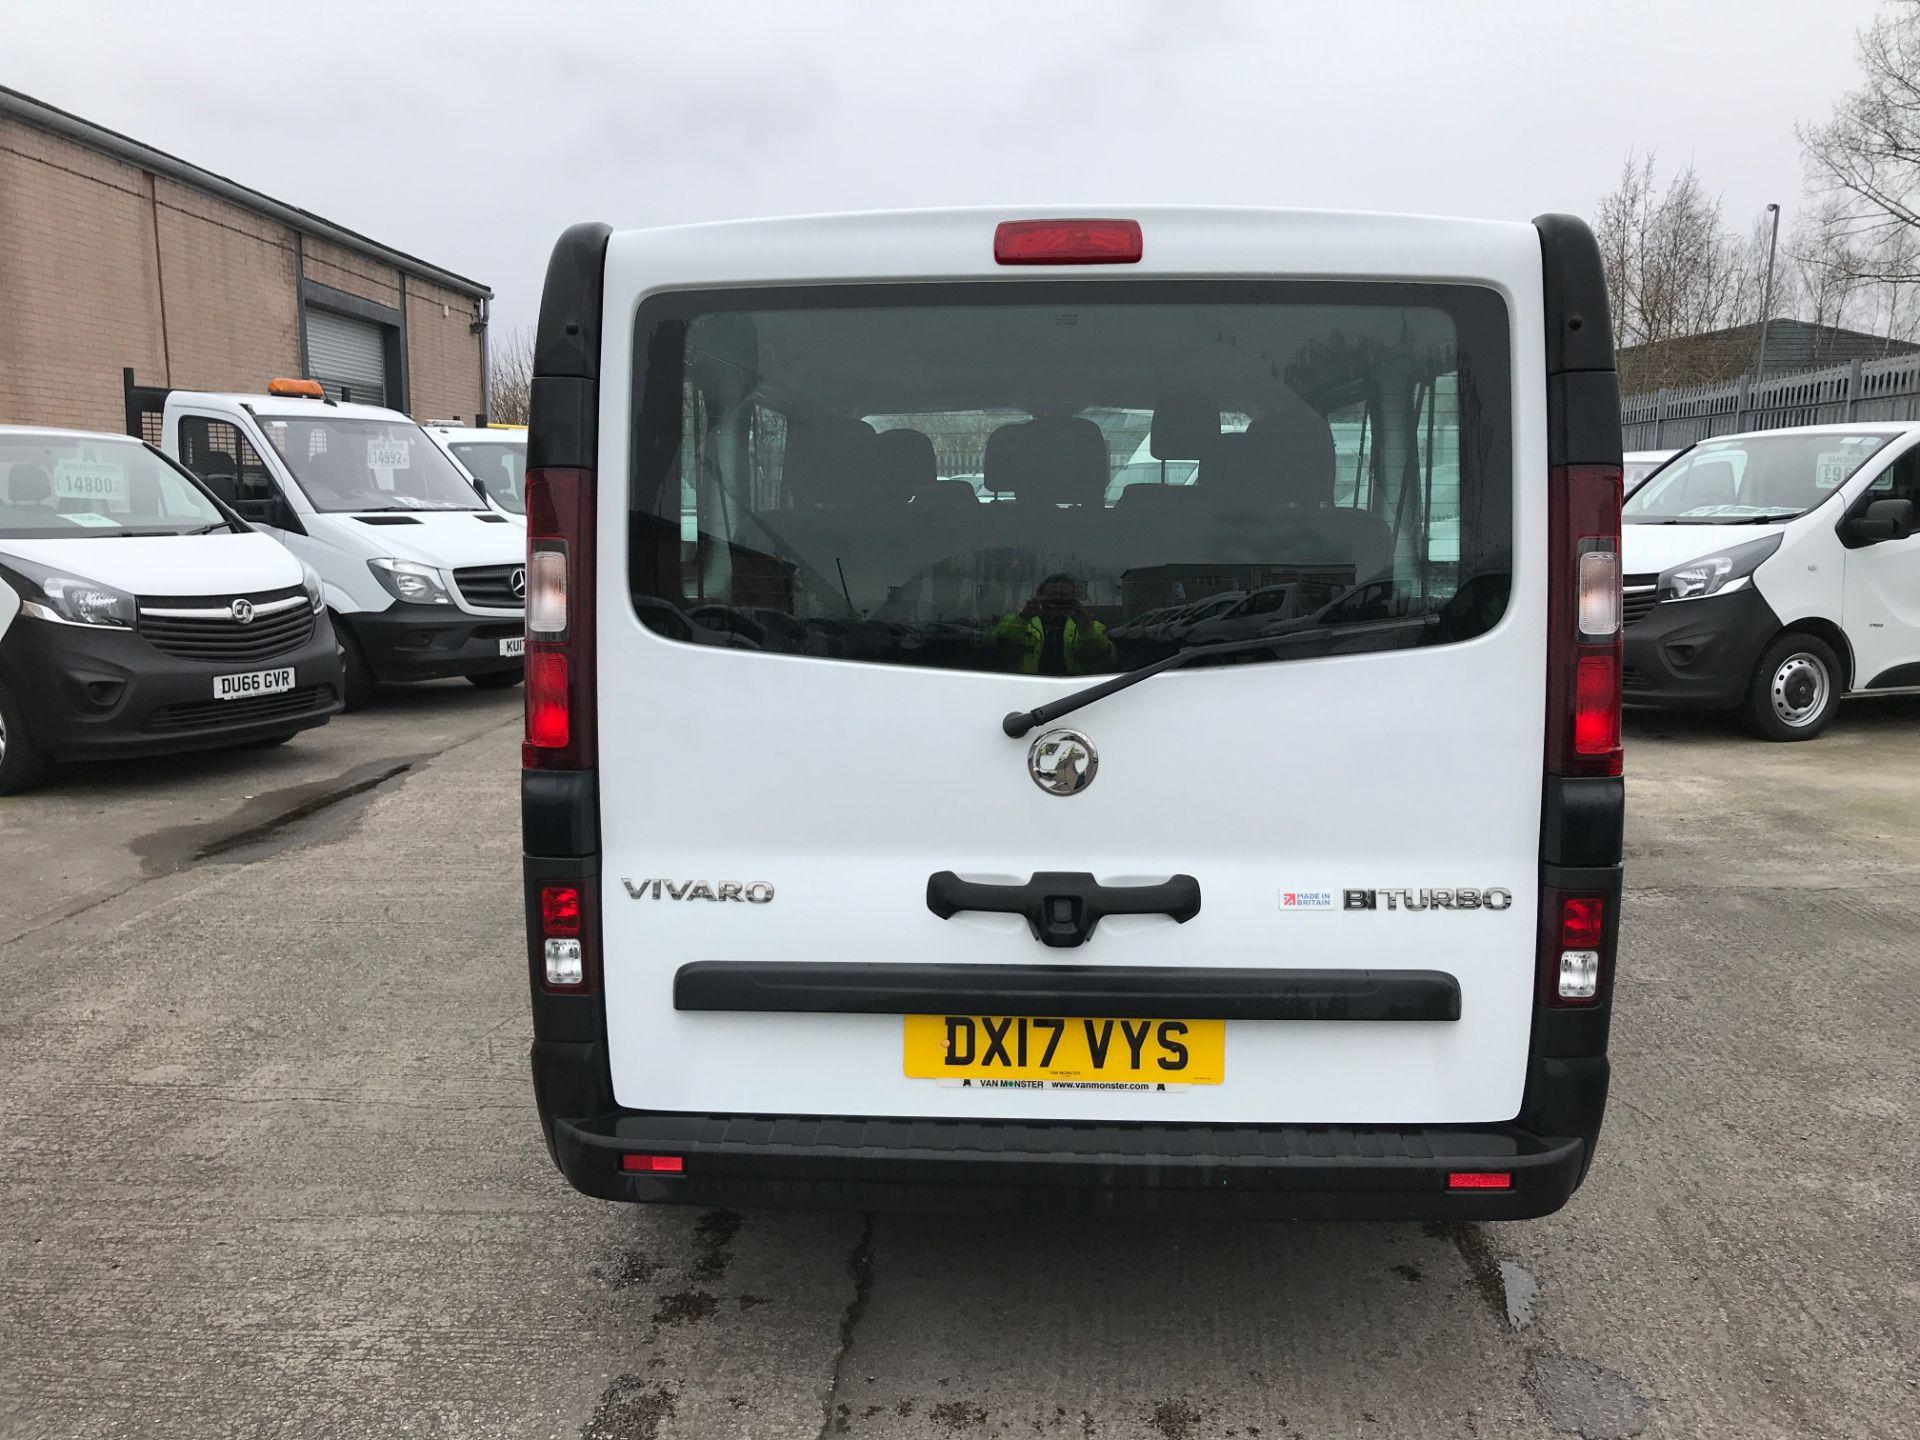 2017 Vauxhall Vivaro 2900 L2 H1 1.6BITURBO 125PS ECOFLEX 9 SEAT EURO 6 (DX17VYS) Image 9